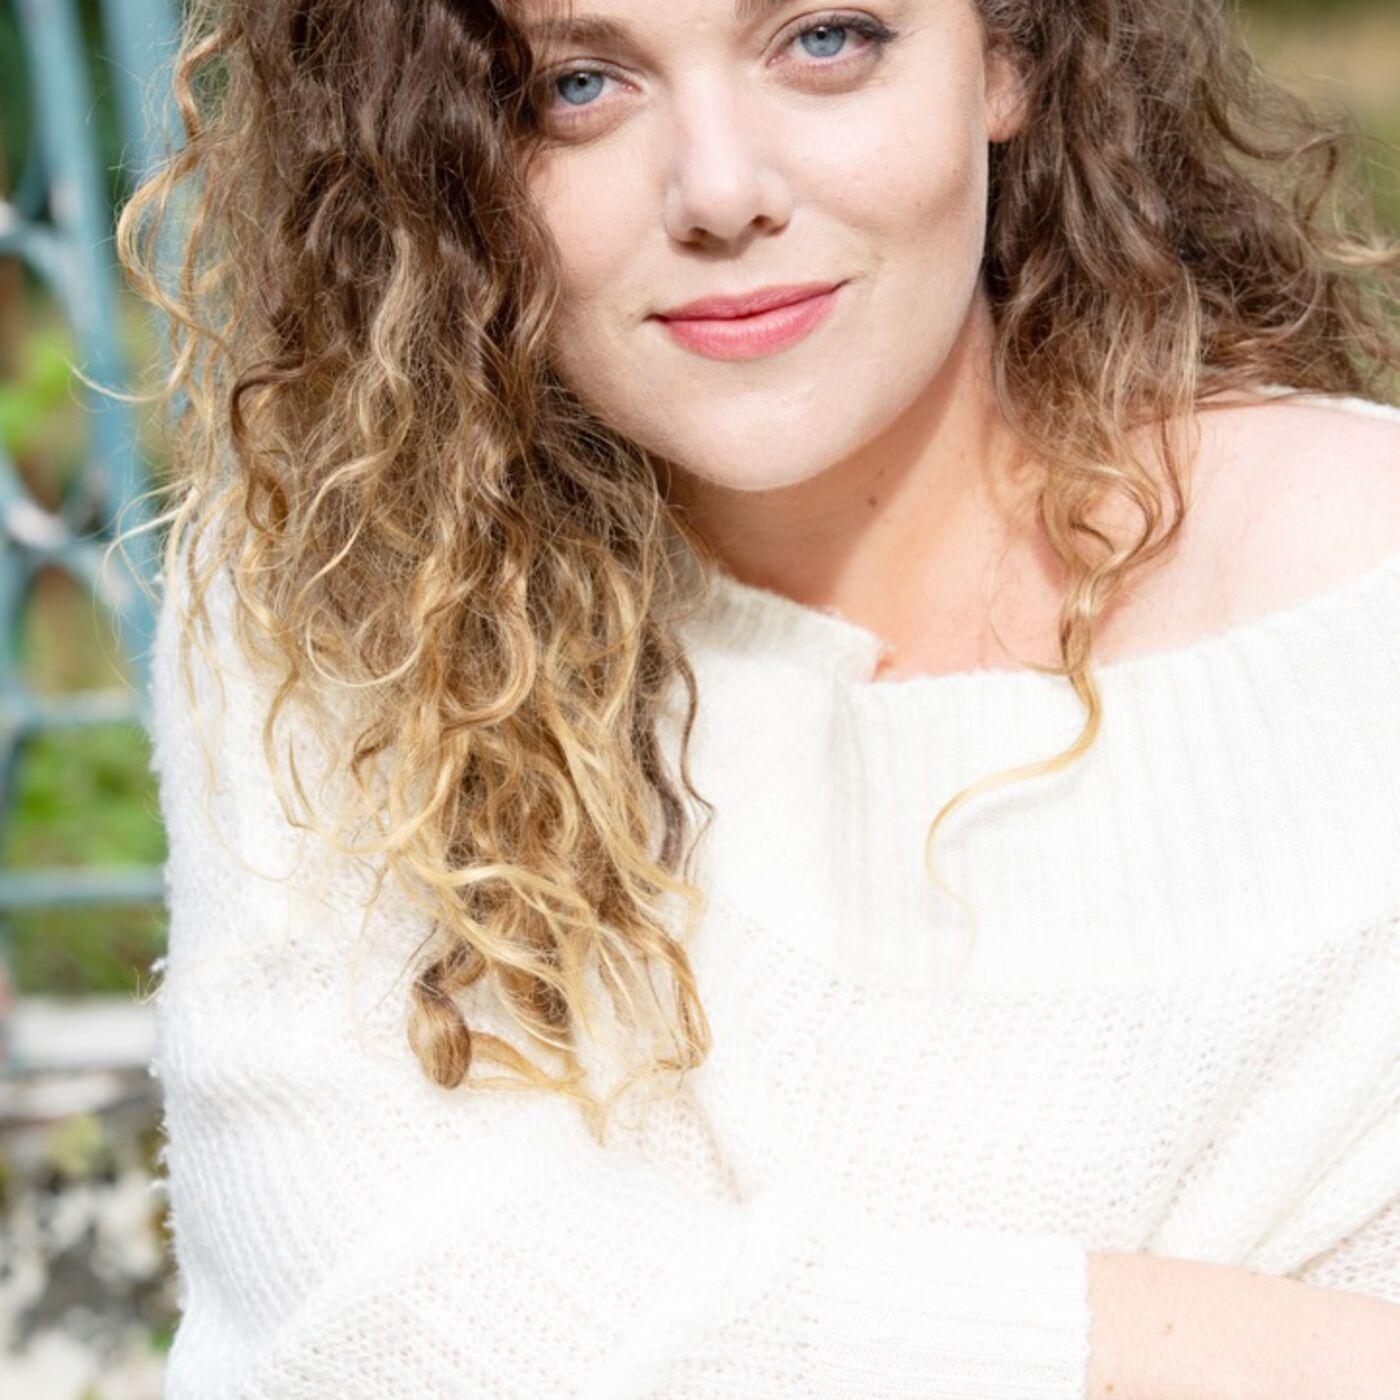 A Conscious Conversation With Madeleine Besson